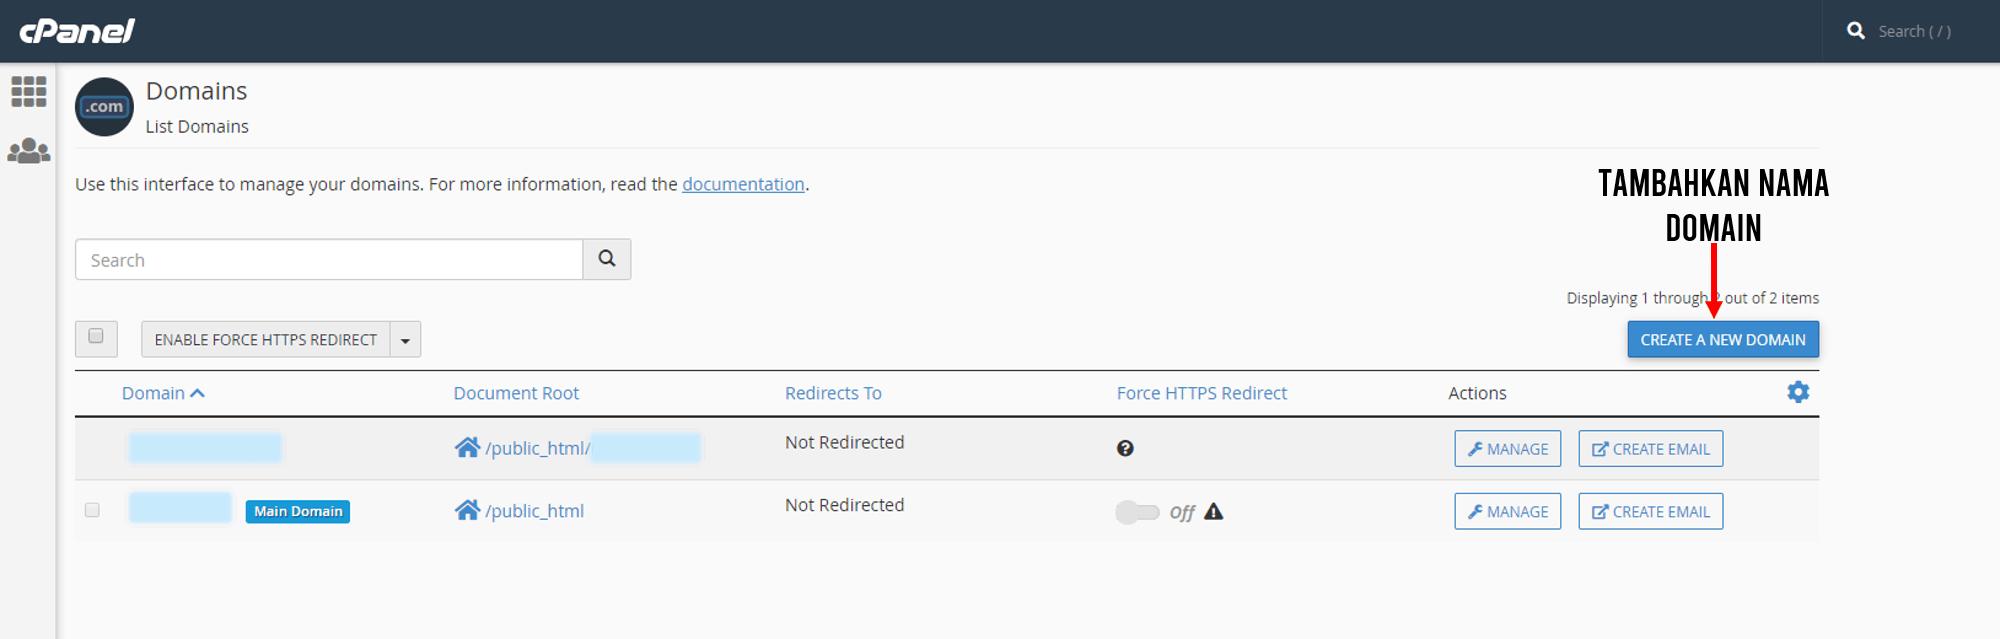 menambahkan nama domain pada cpanel